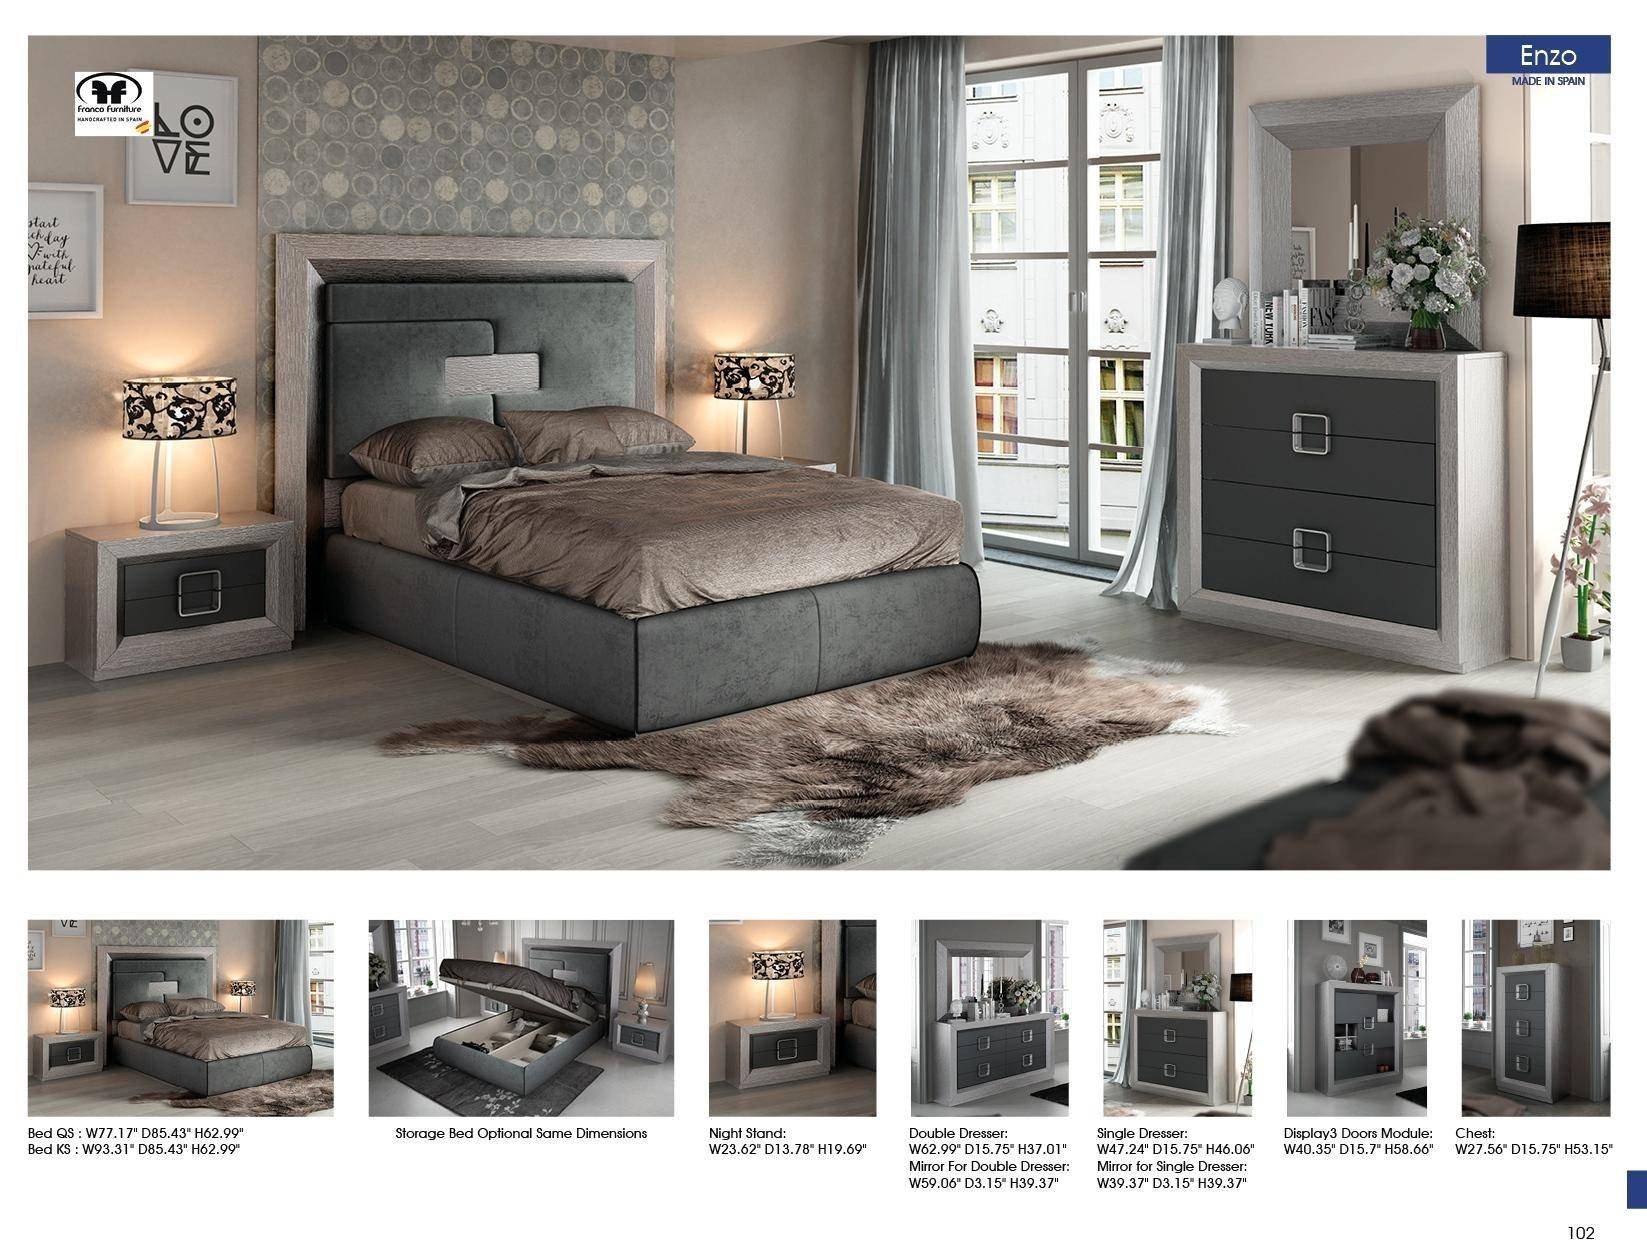 Gray King Bedroom Set Lovely Esf Enzo King Platform Bedroom Set 5 Pcs In Gray Fabric